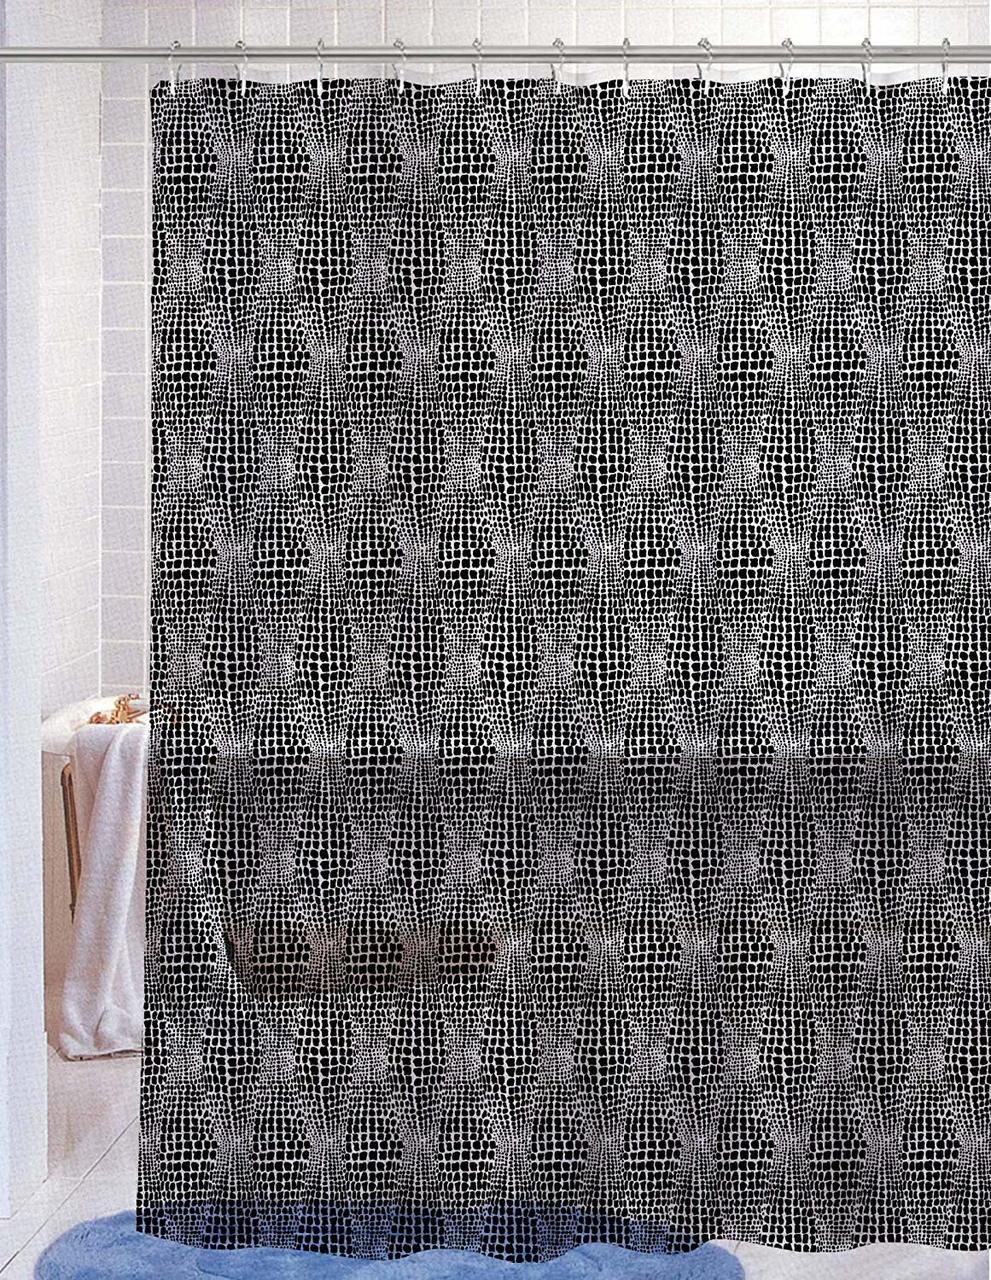 Shower Curtain PVC Free PEVA Printed Fun Colorful Paisley Floral Print 70x72 Kelsey